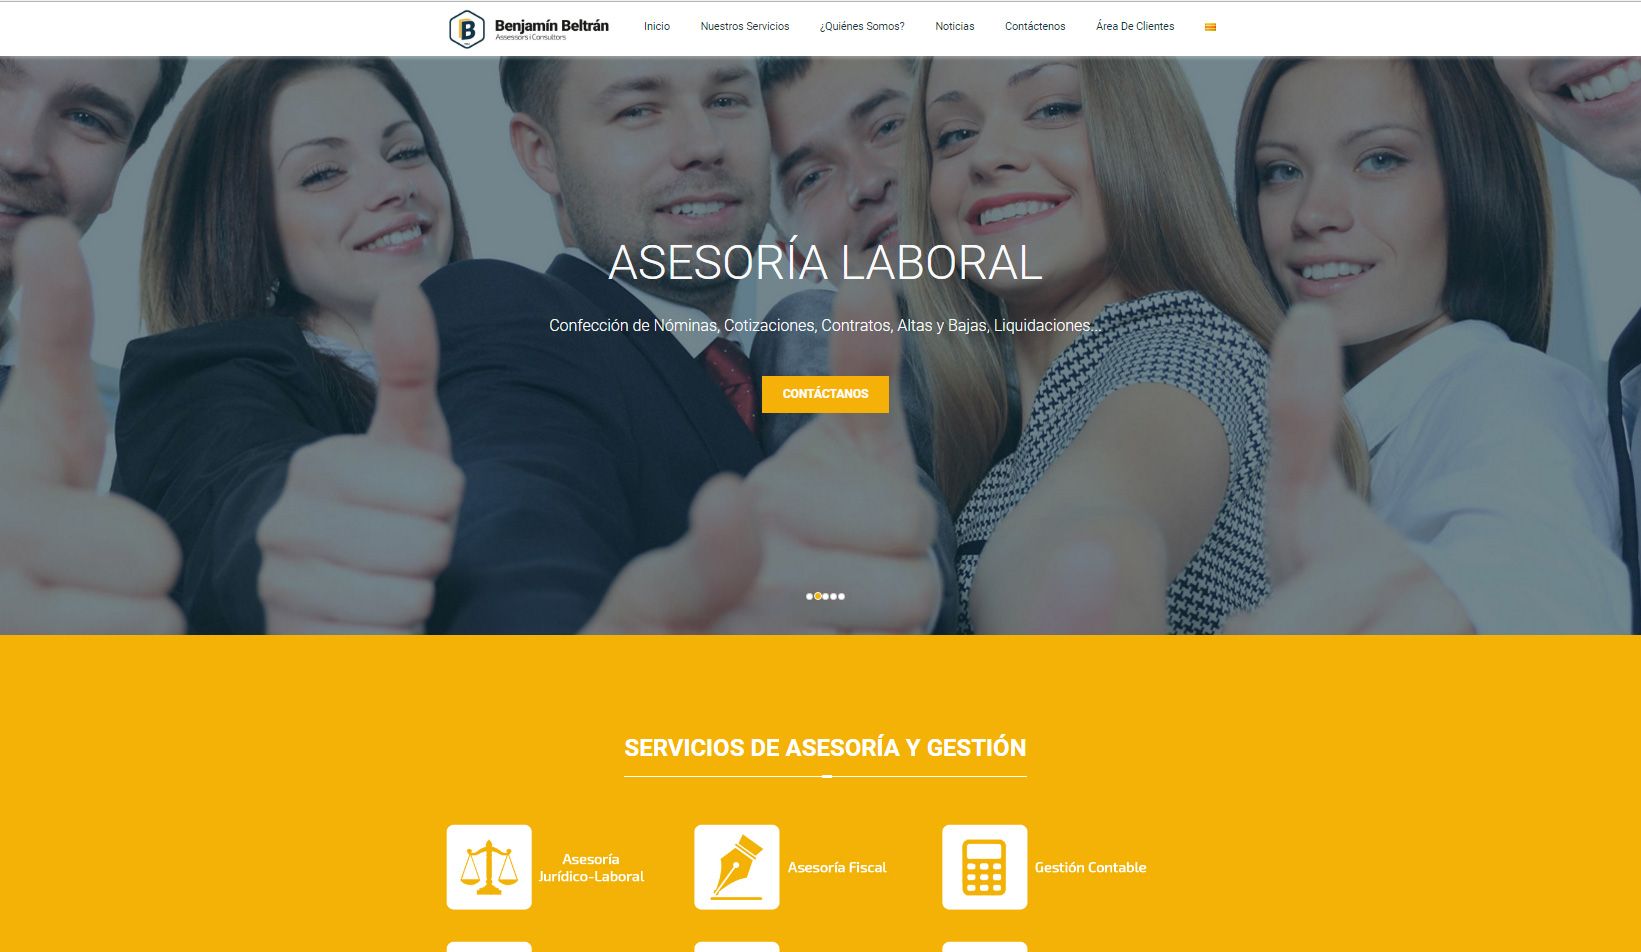 Nueva Web www.benjasse.com con el novedoso diseño Parallax para móvil +SEO +Seguridad SSL +Autoadministrable